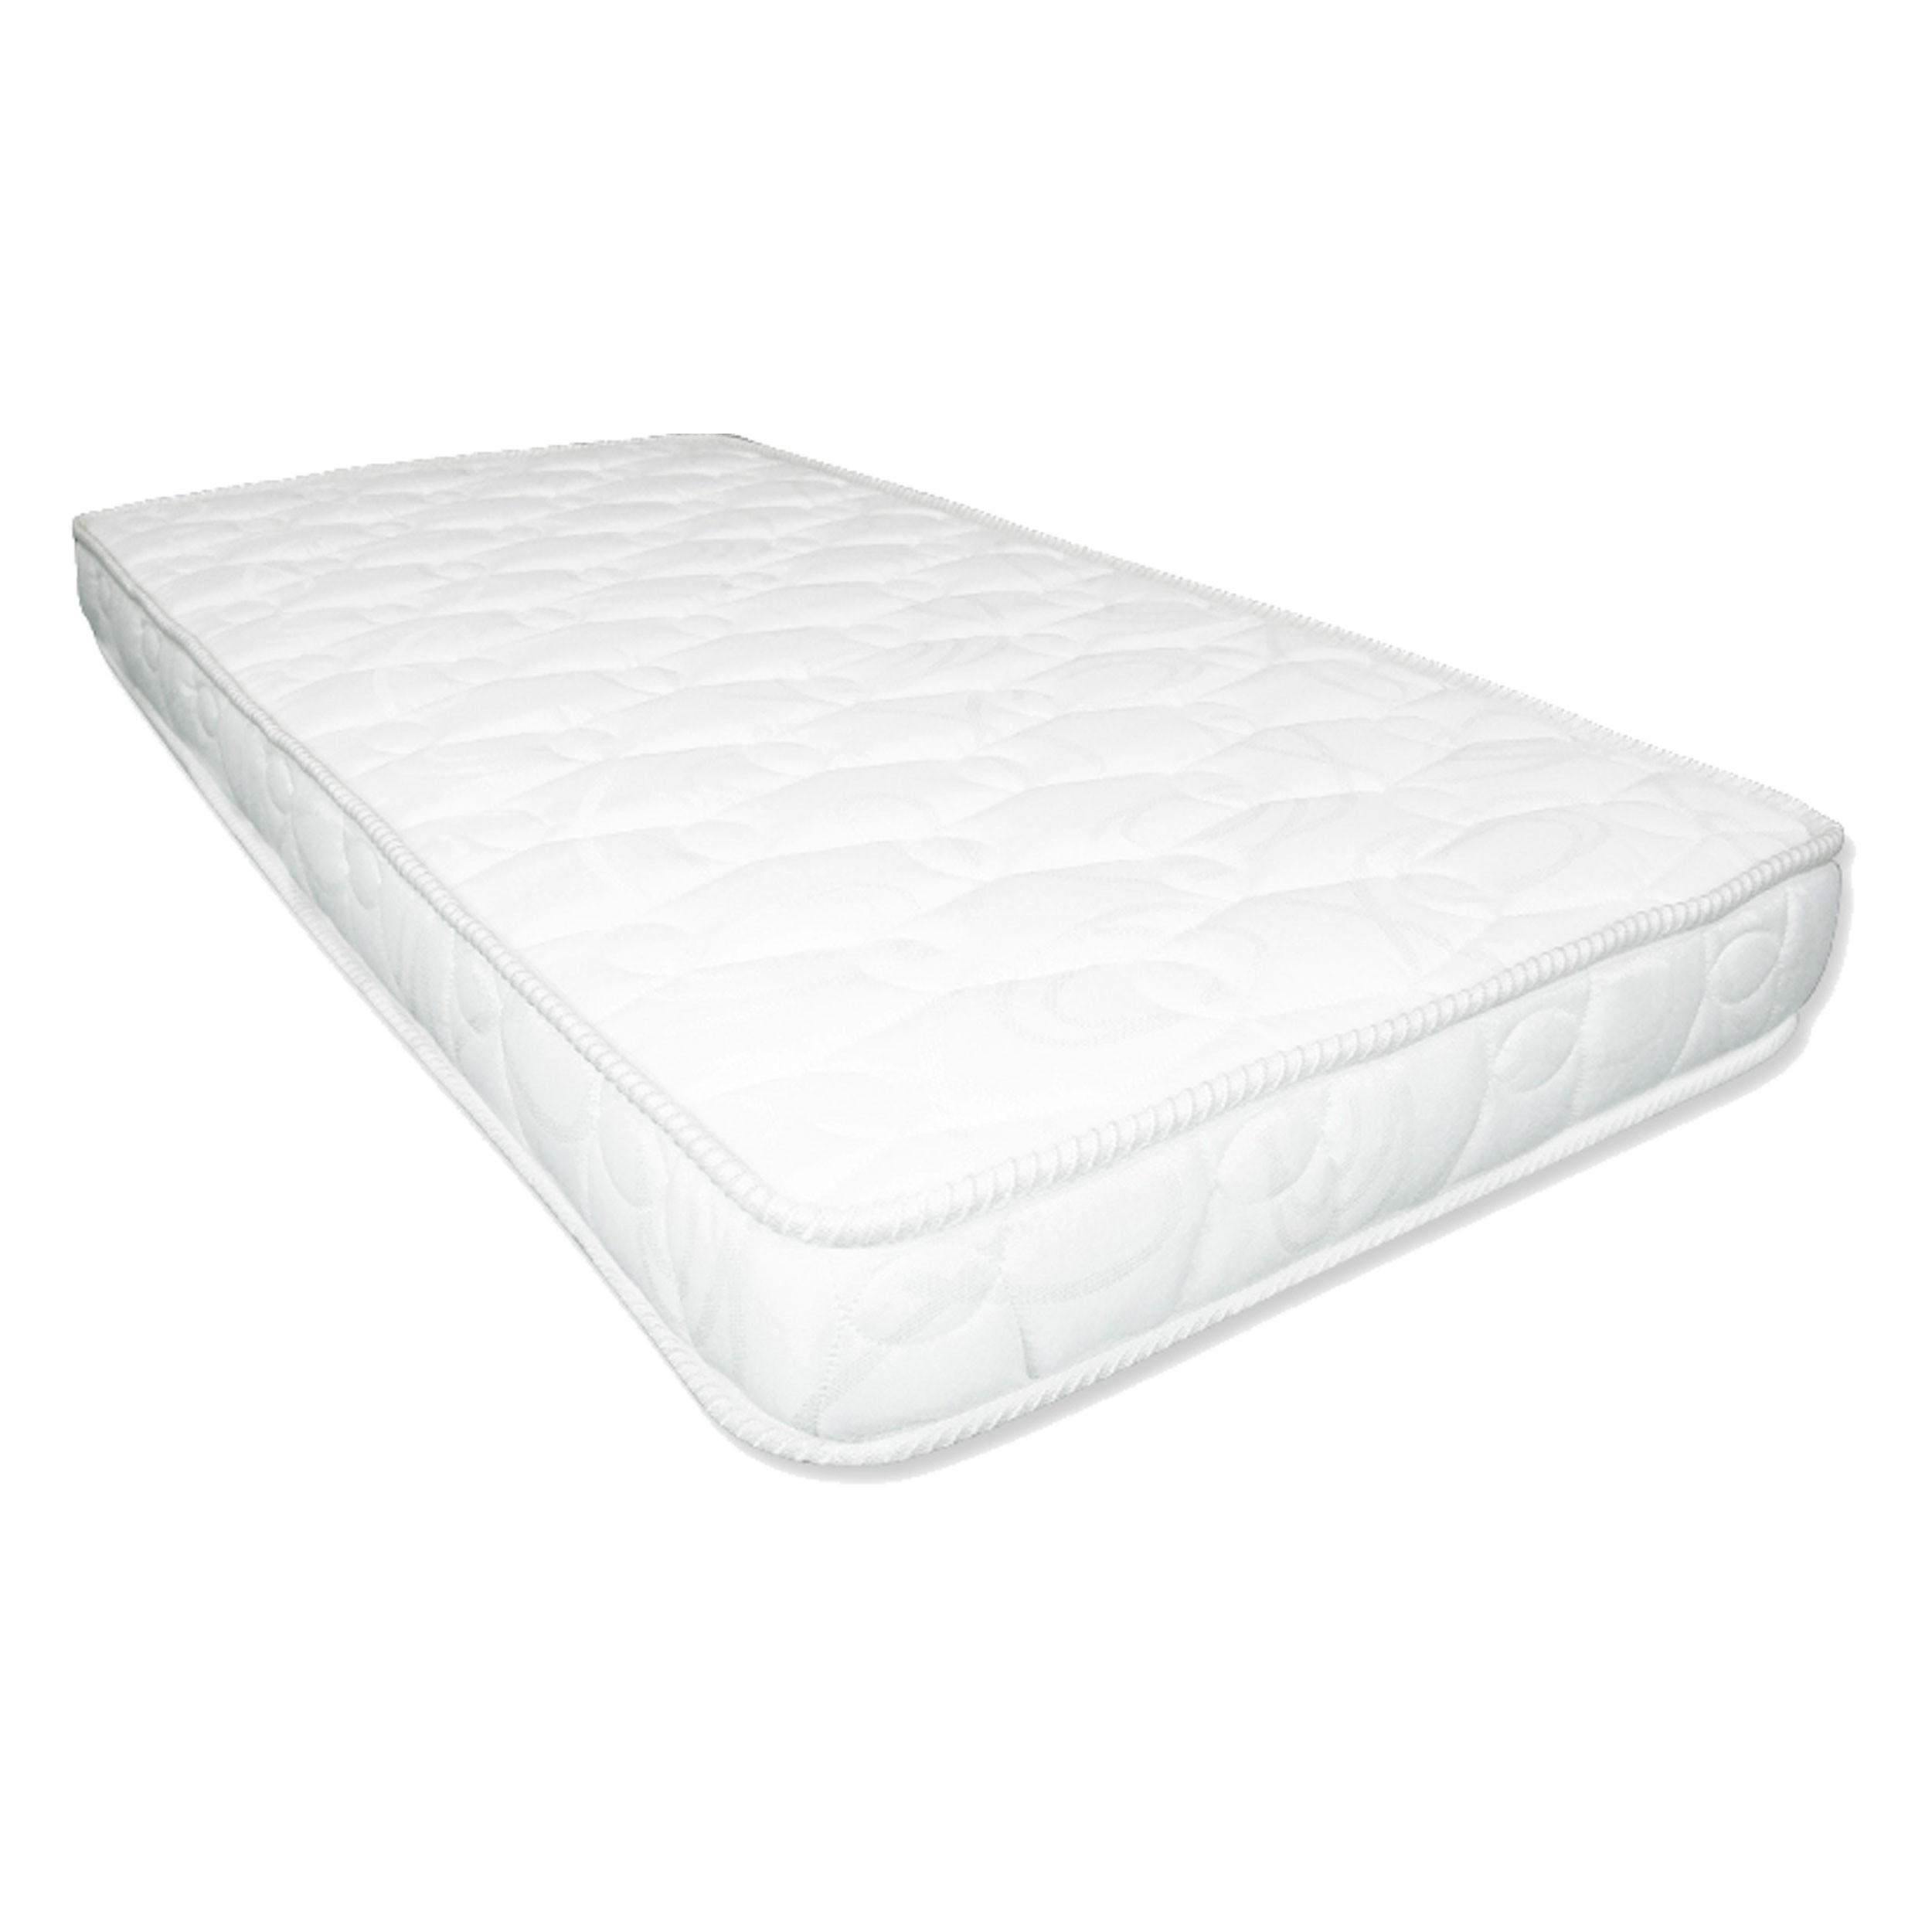 matelas confort b b 60x120 cm adoptez nos matelas confort b b 60x120cm rdv d co. Black Bedroom Furniture Sets. Home Design Ideas